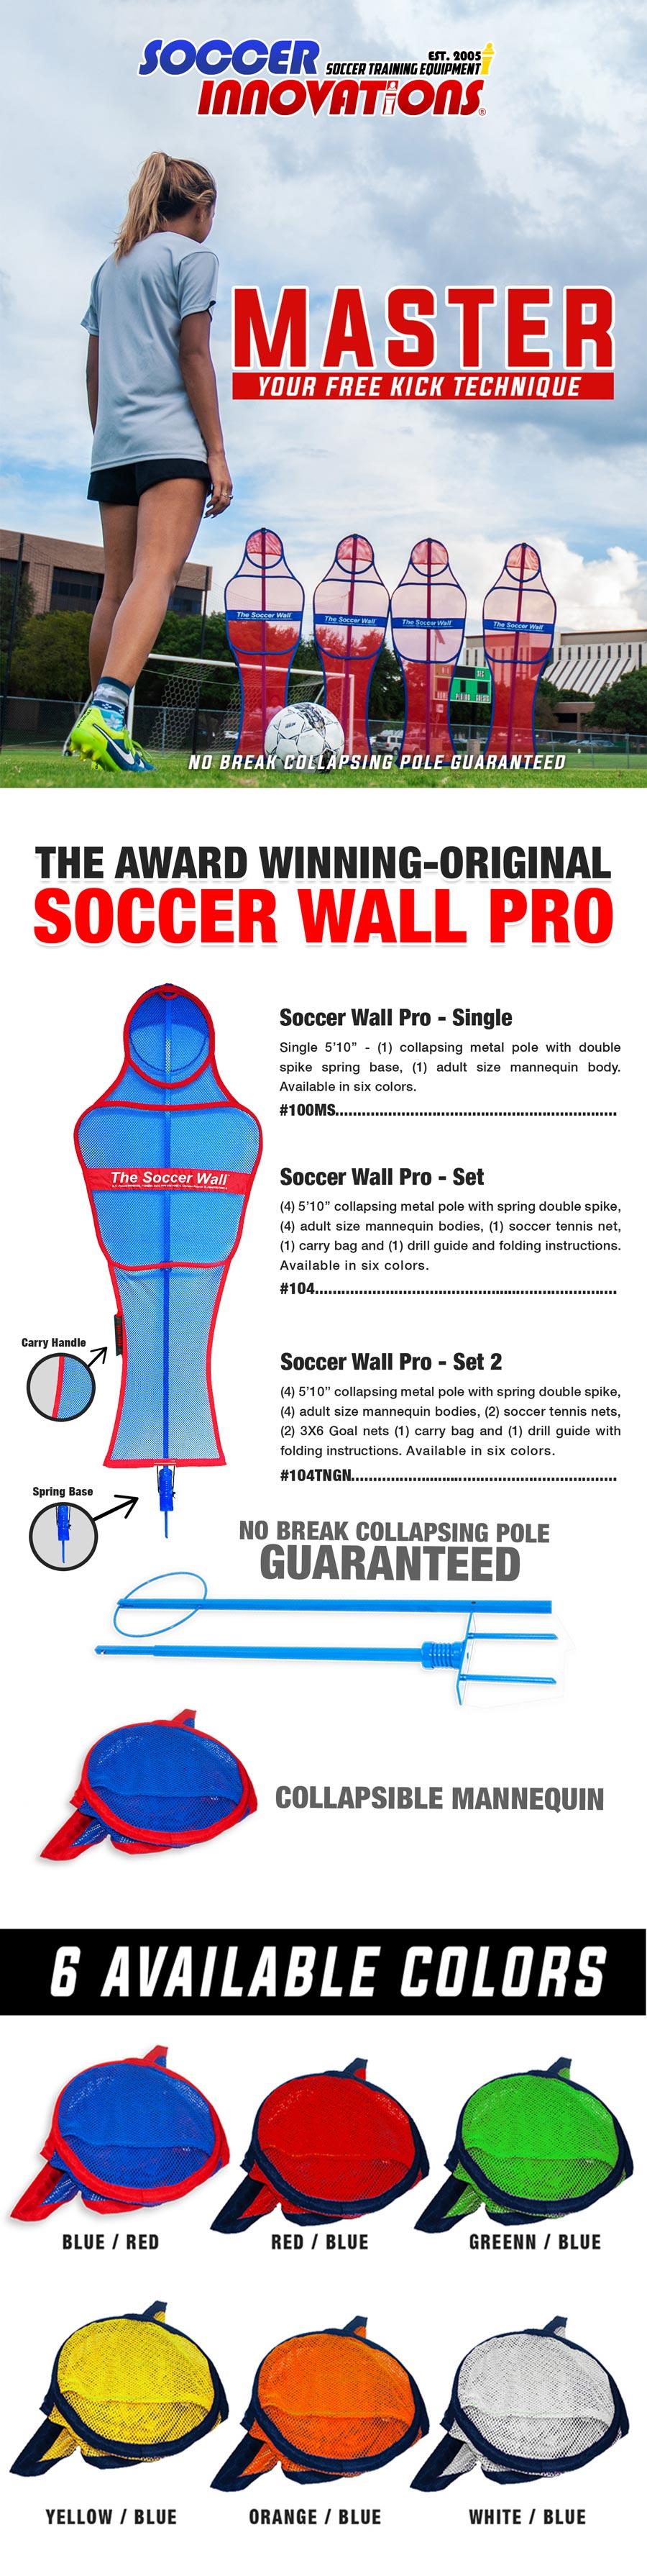 04-pro-infographic.jpg